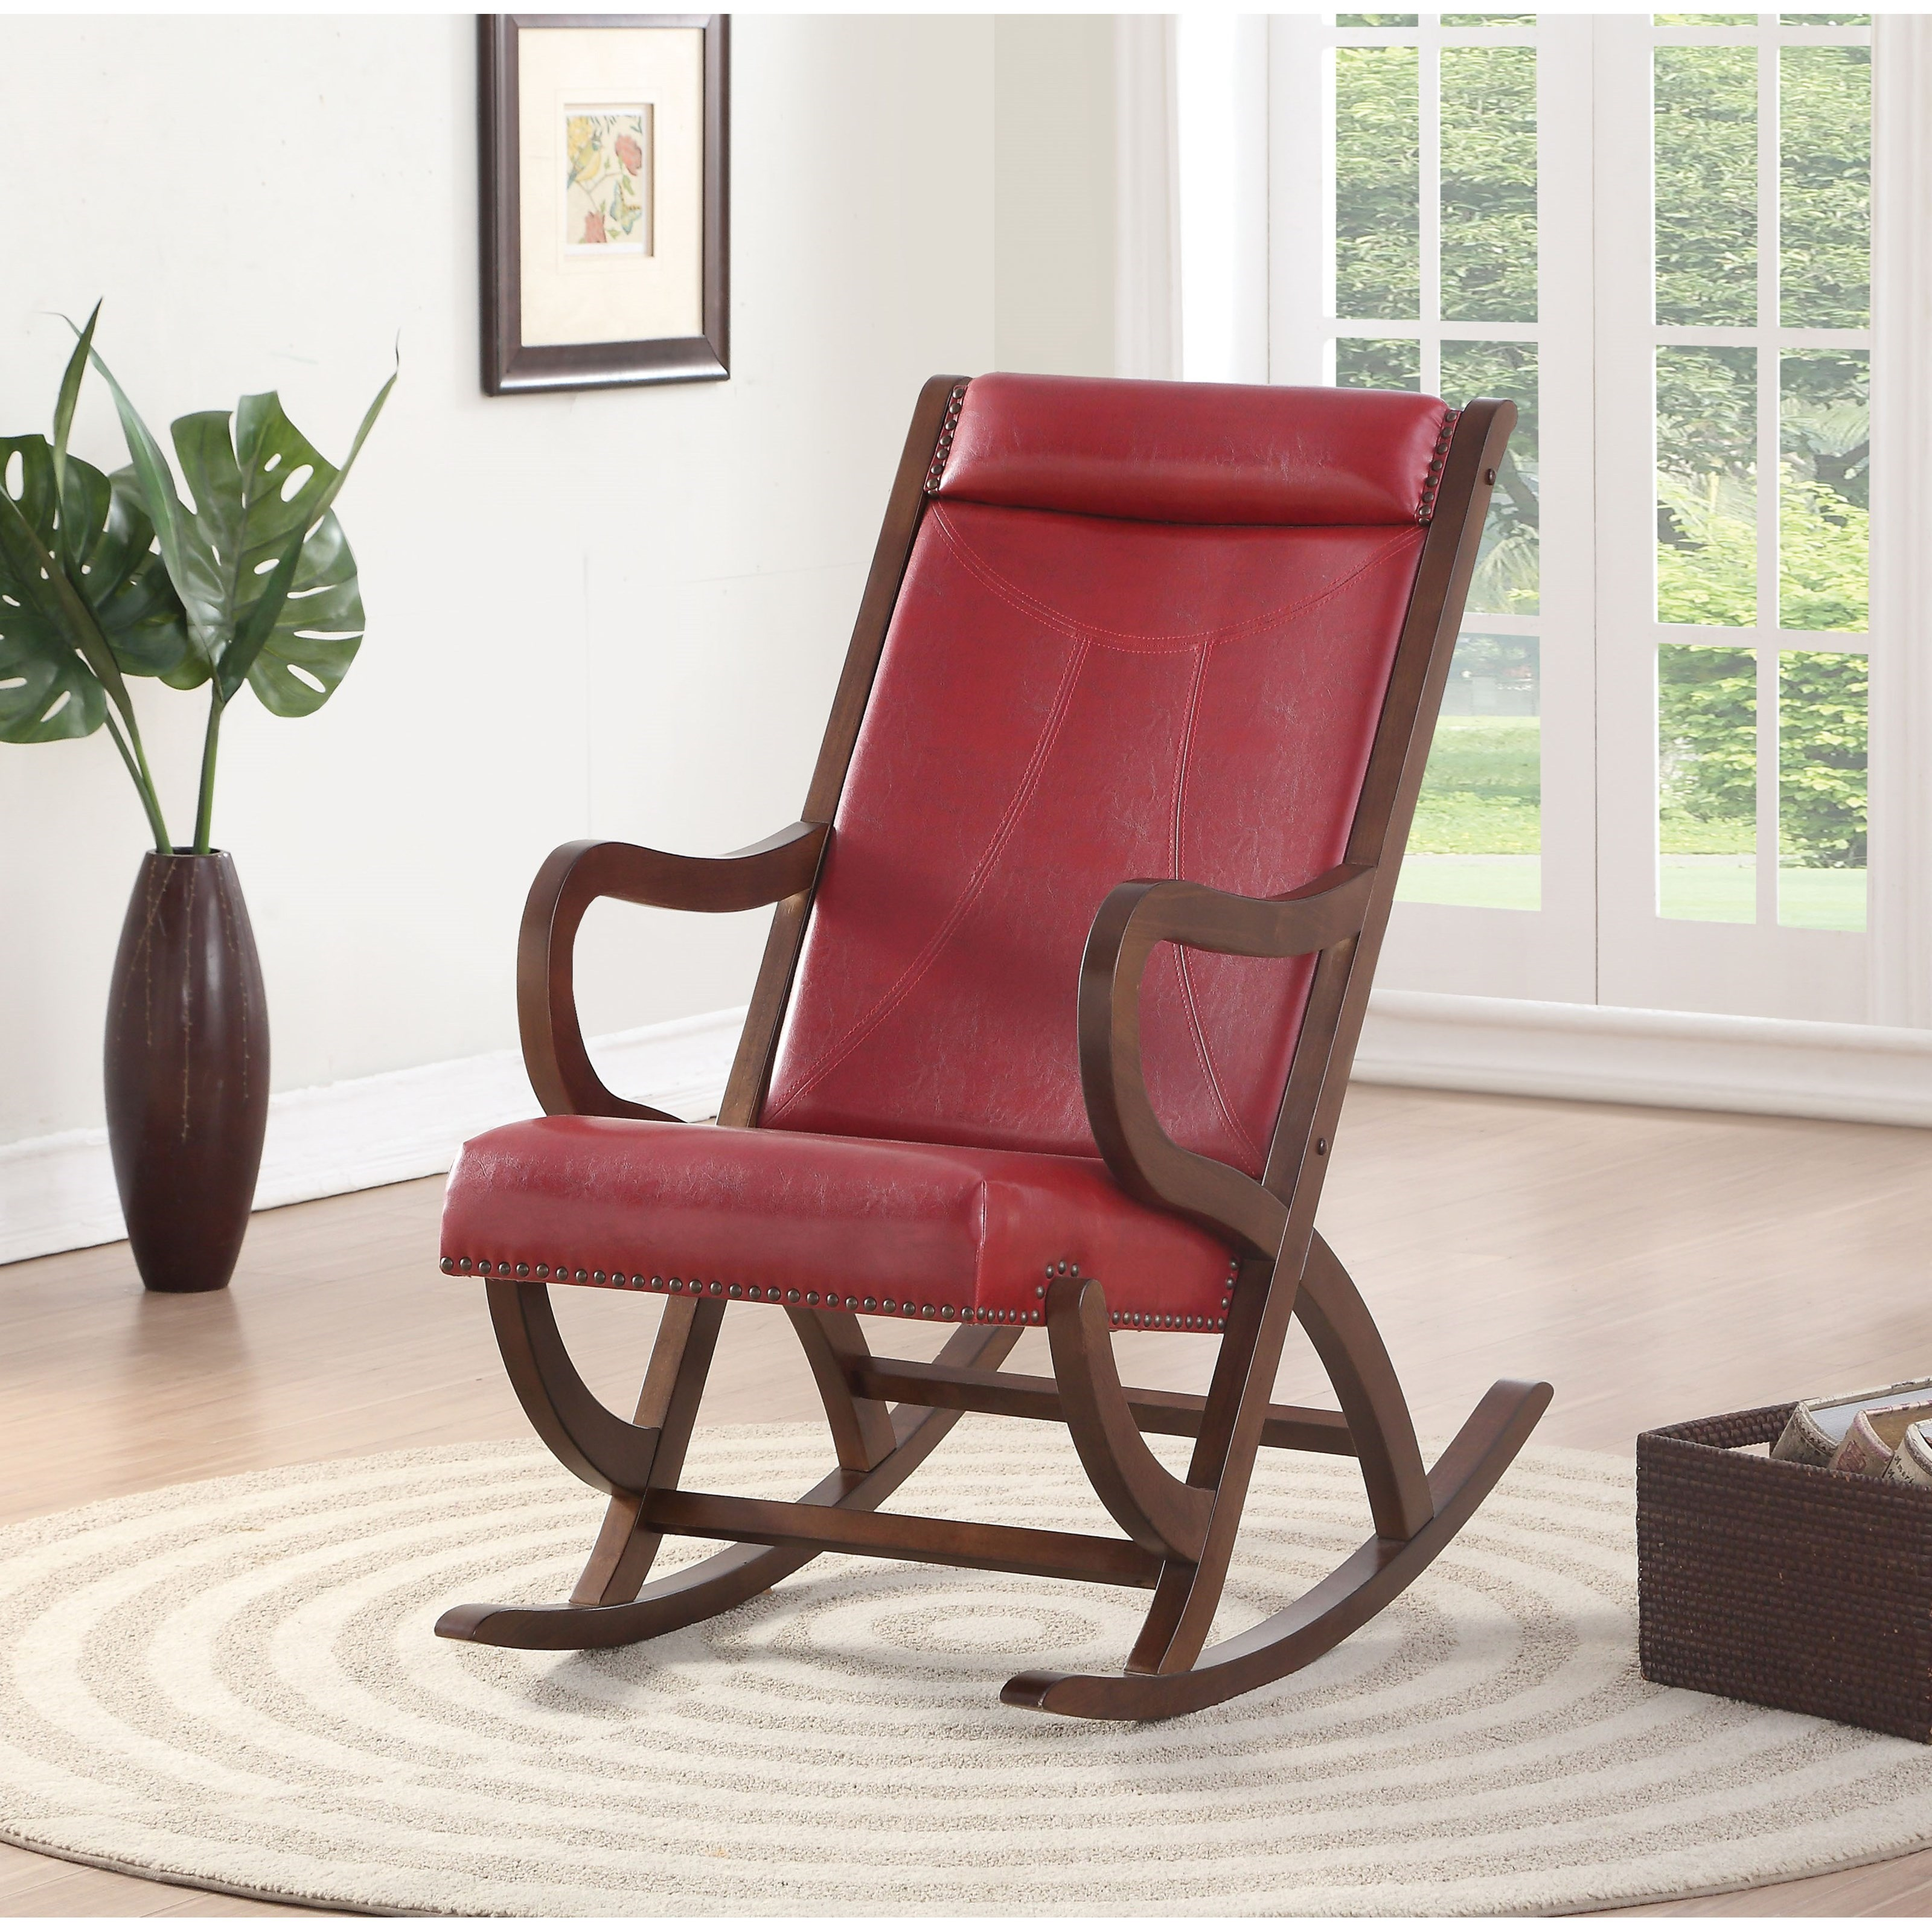 Acme Furniture Triton Contemporary Rocking Chair With Nailhead Trim A1 Furniture Mattress Wood Rockers